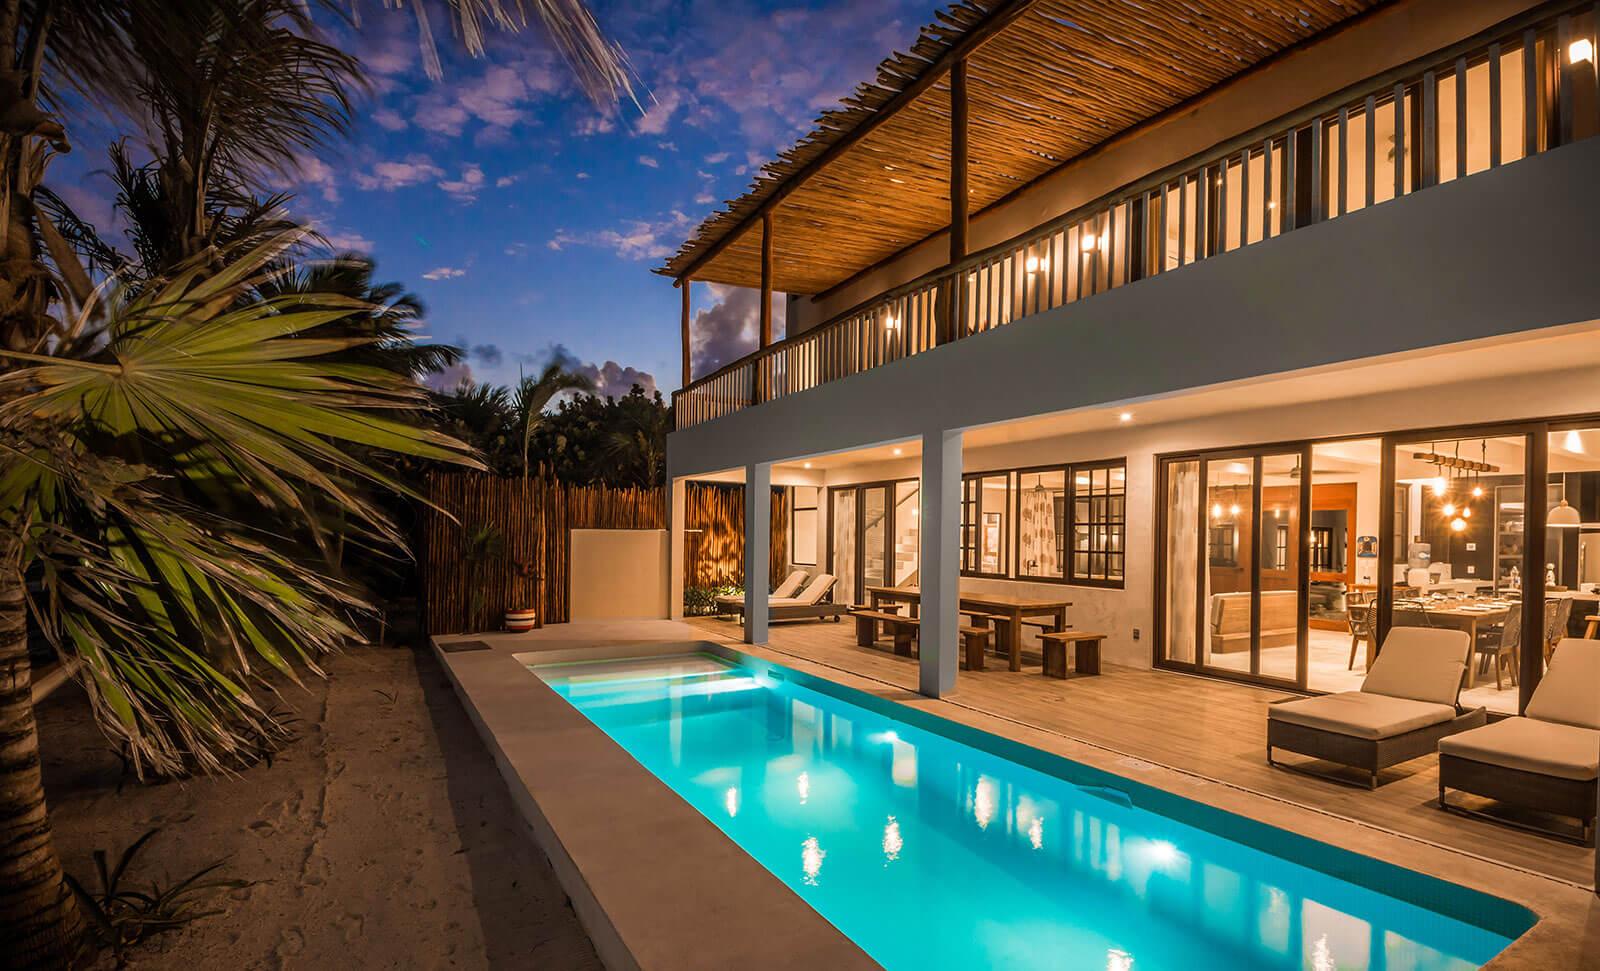 Maya_Luxe_Riviera_Maya_Luxury_Villas_Experiences_Tulum_Soliman_Bay_5_Bedrooms_6.jpg